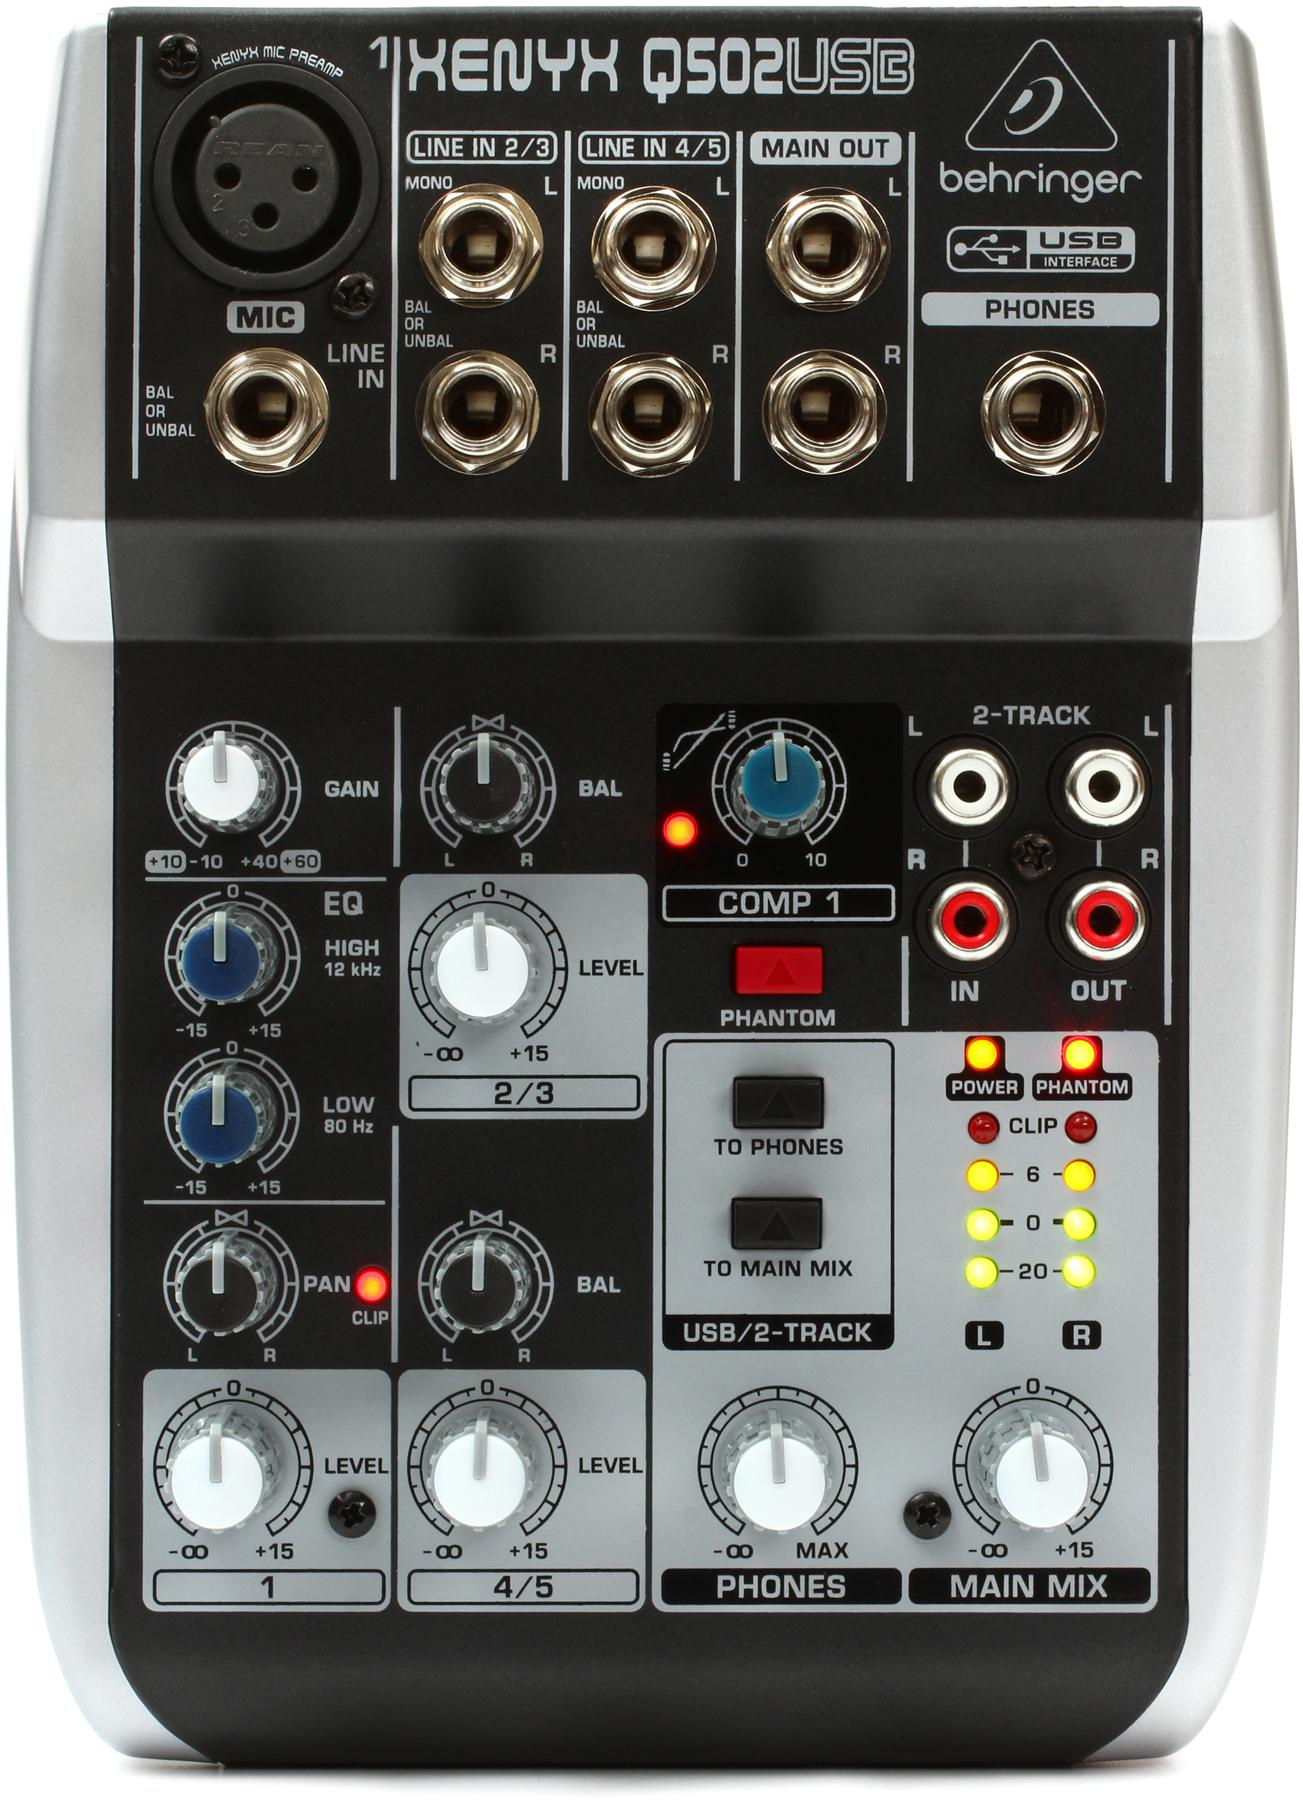 3. Behringer Xenyx Q502USB